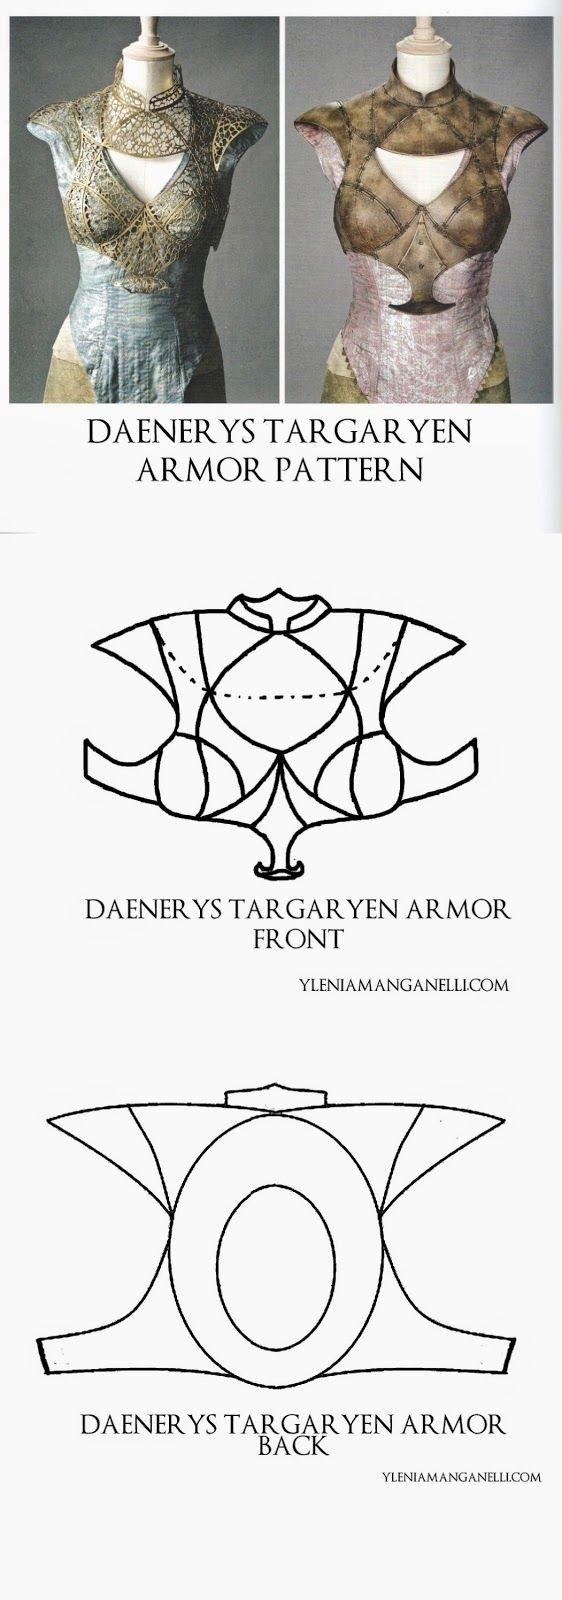 Princess & Dragon - Ylenia Manganelli : Daenerys Targaryen - Cosplay Costume - Cage/Armor Turorial and Resources (Pattern #7)